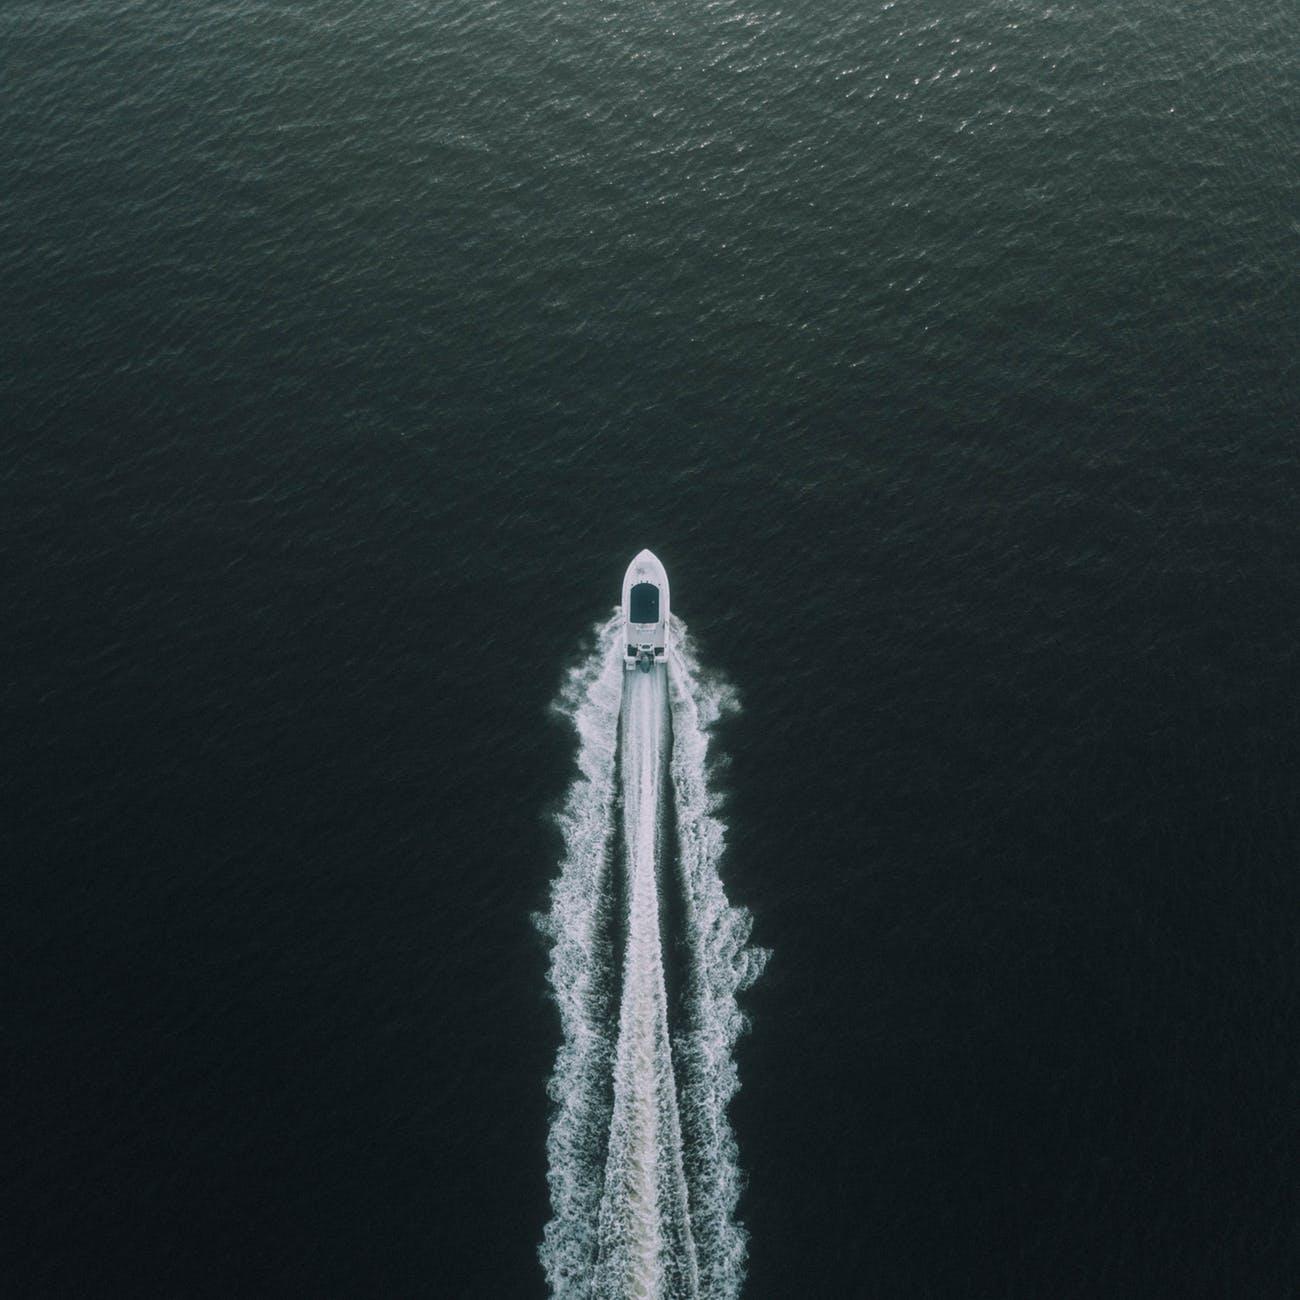 boat deep ocean idyllic leisure